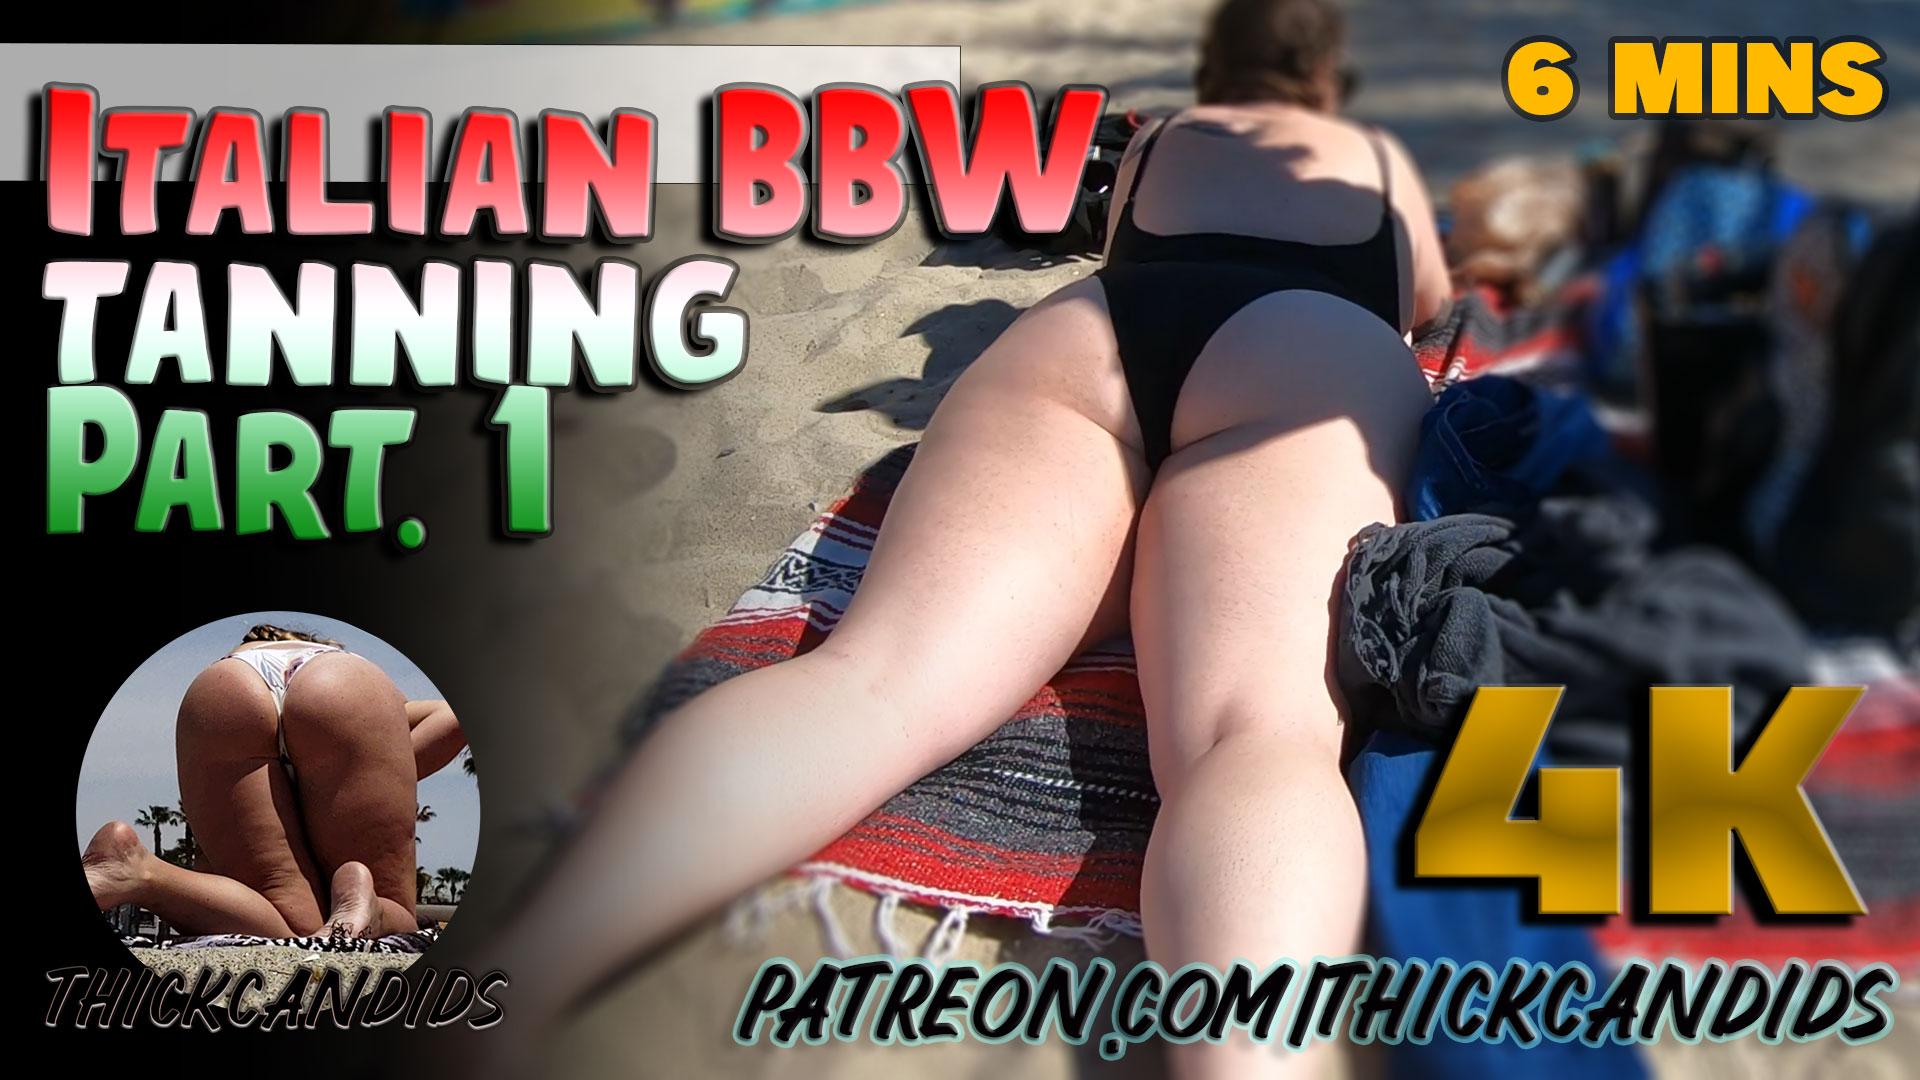 Italian-BBW-tanning-part.-1